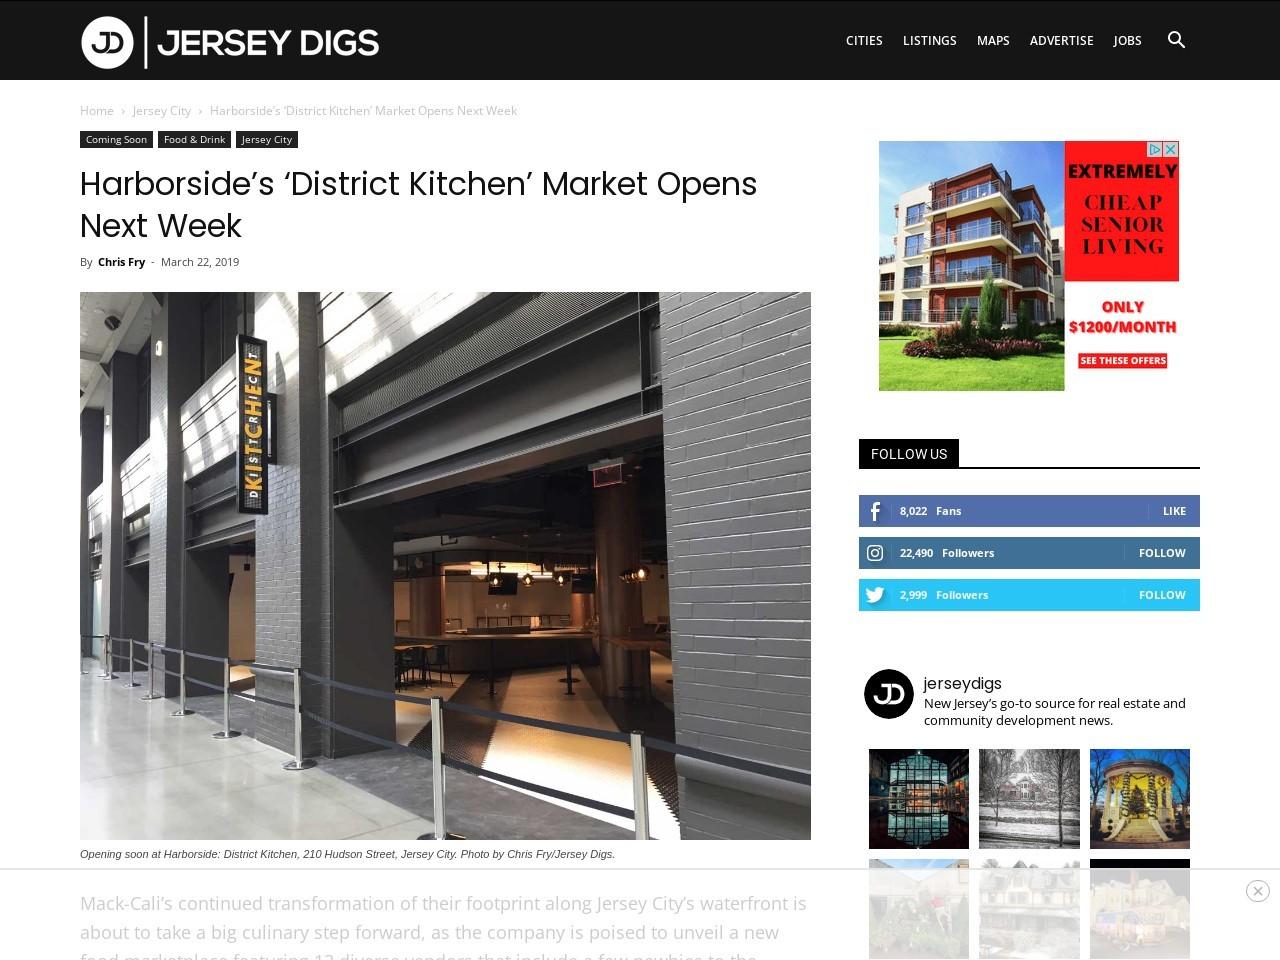 Harborside's 'District Kitchen' Market Opens Next Week